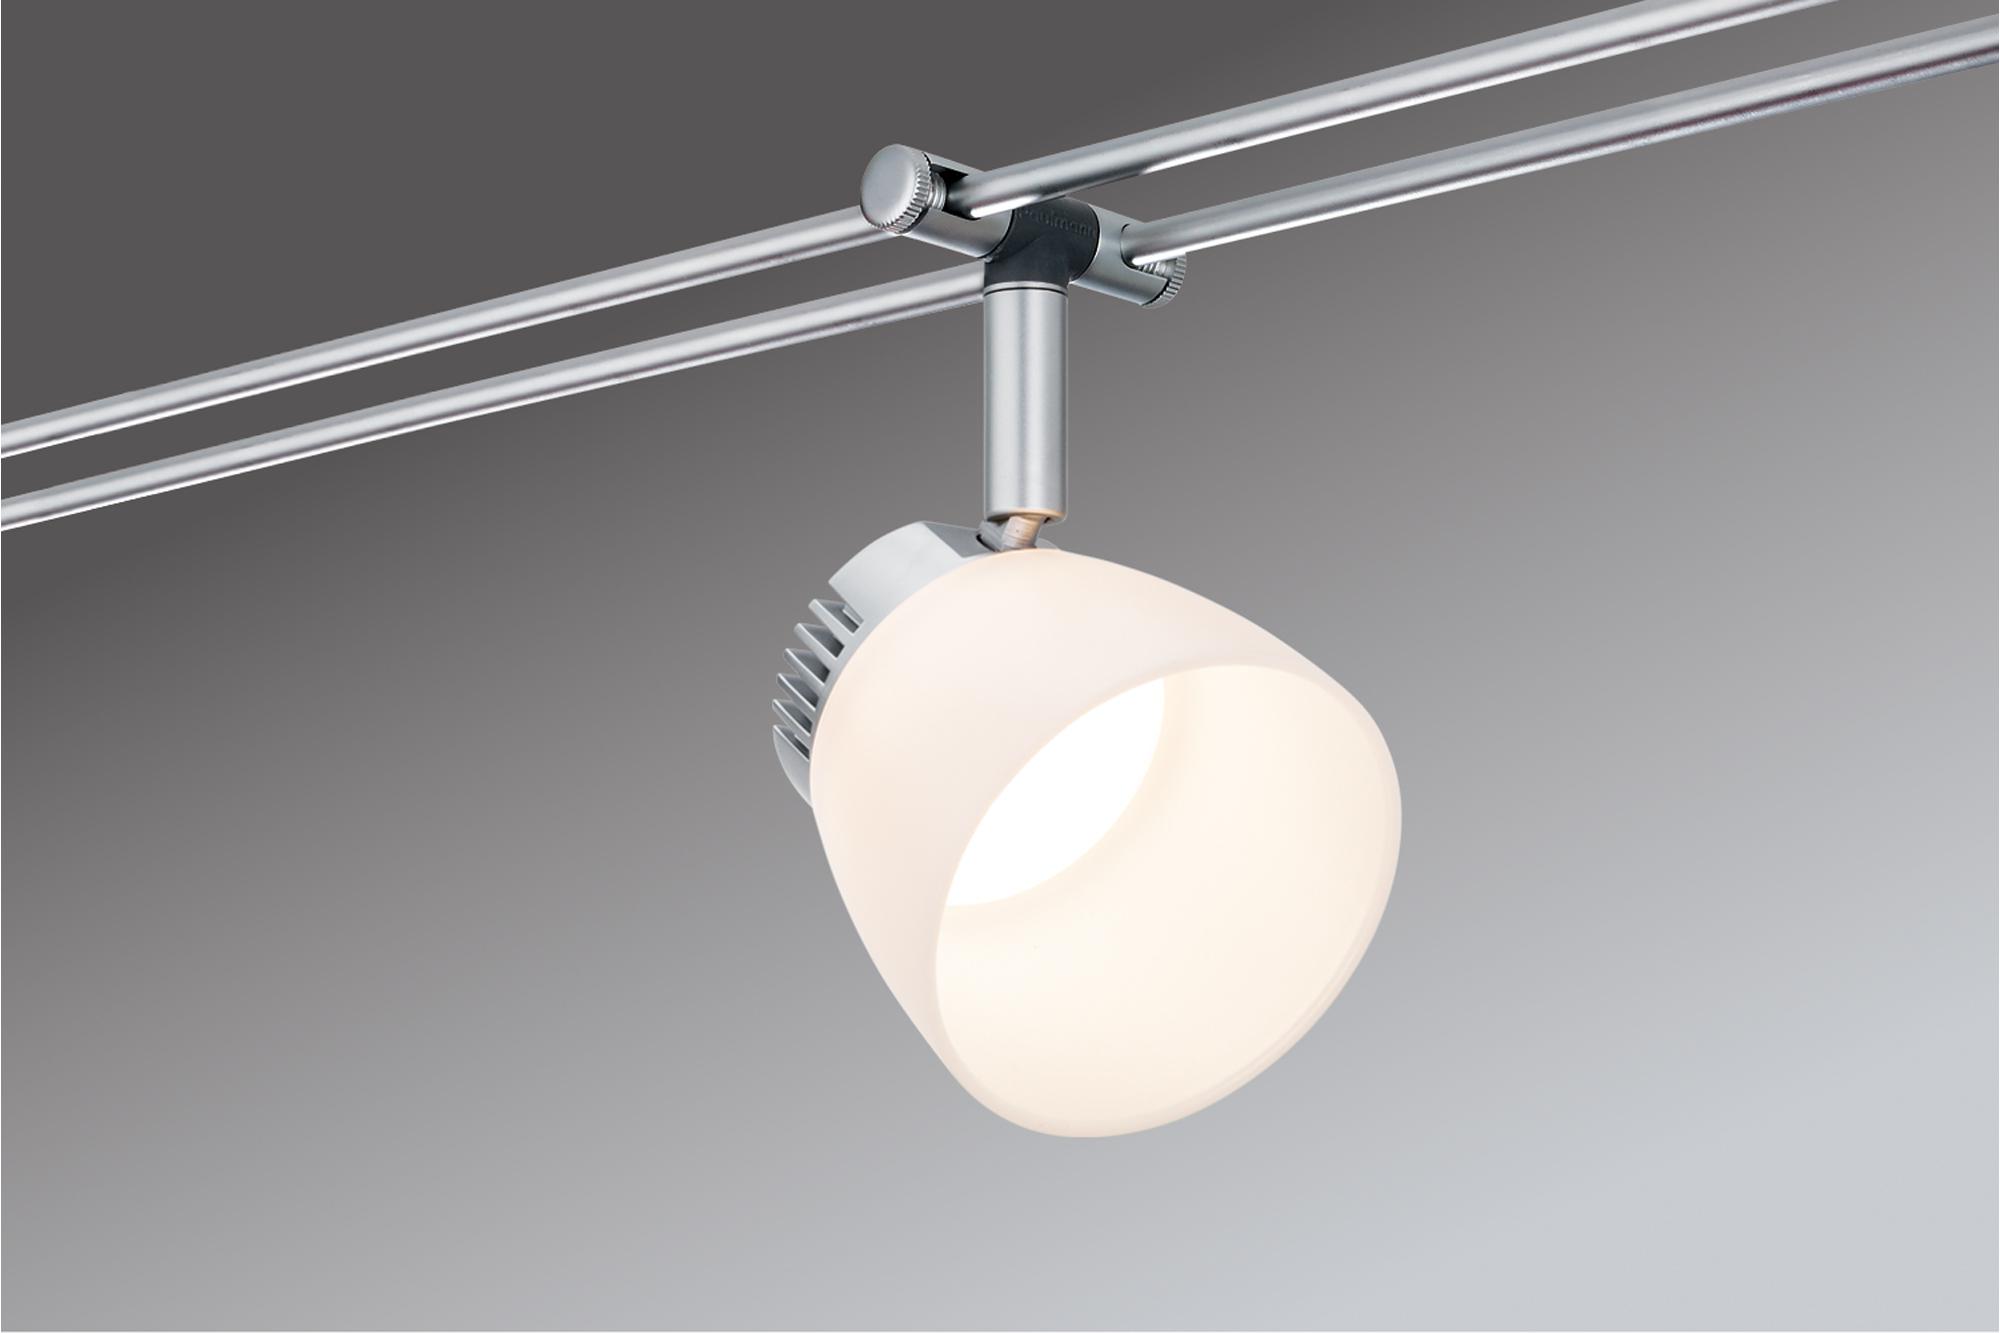 led streifen deckenmontage 2 meter led profil pu stuckleiste indirekte beleuchtung sto fest. Black Bedroom Furniture Sets. Home Design Ideas